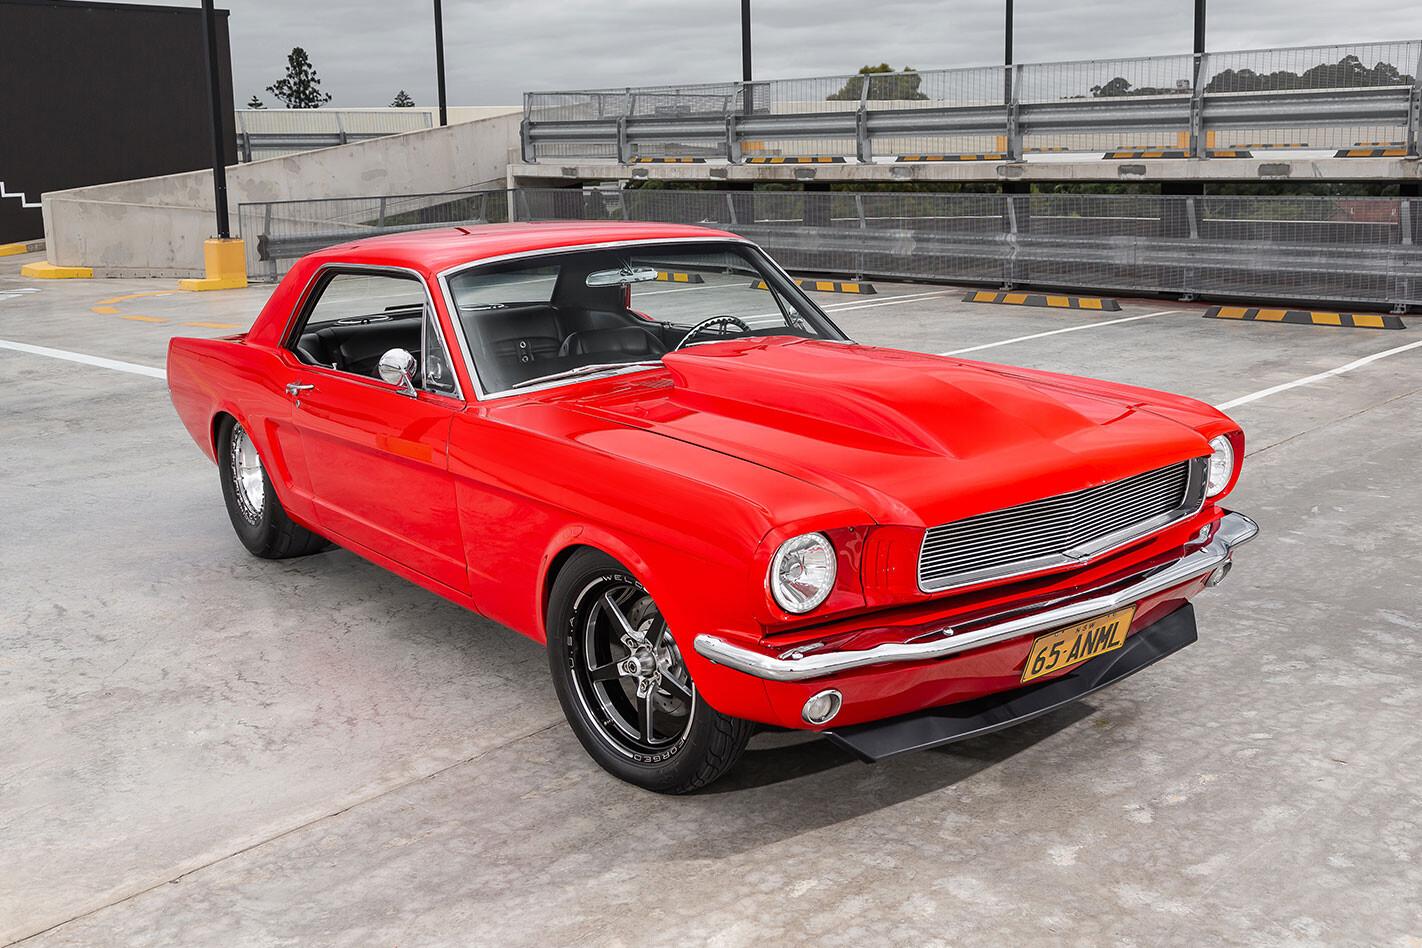 Ford Mustang 1422 Jpg